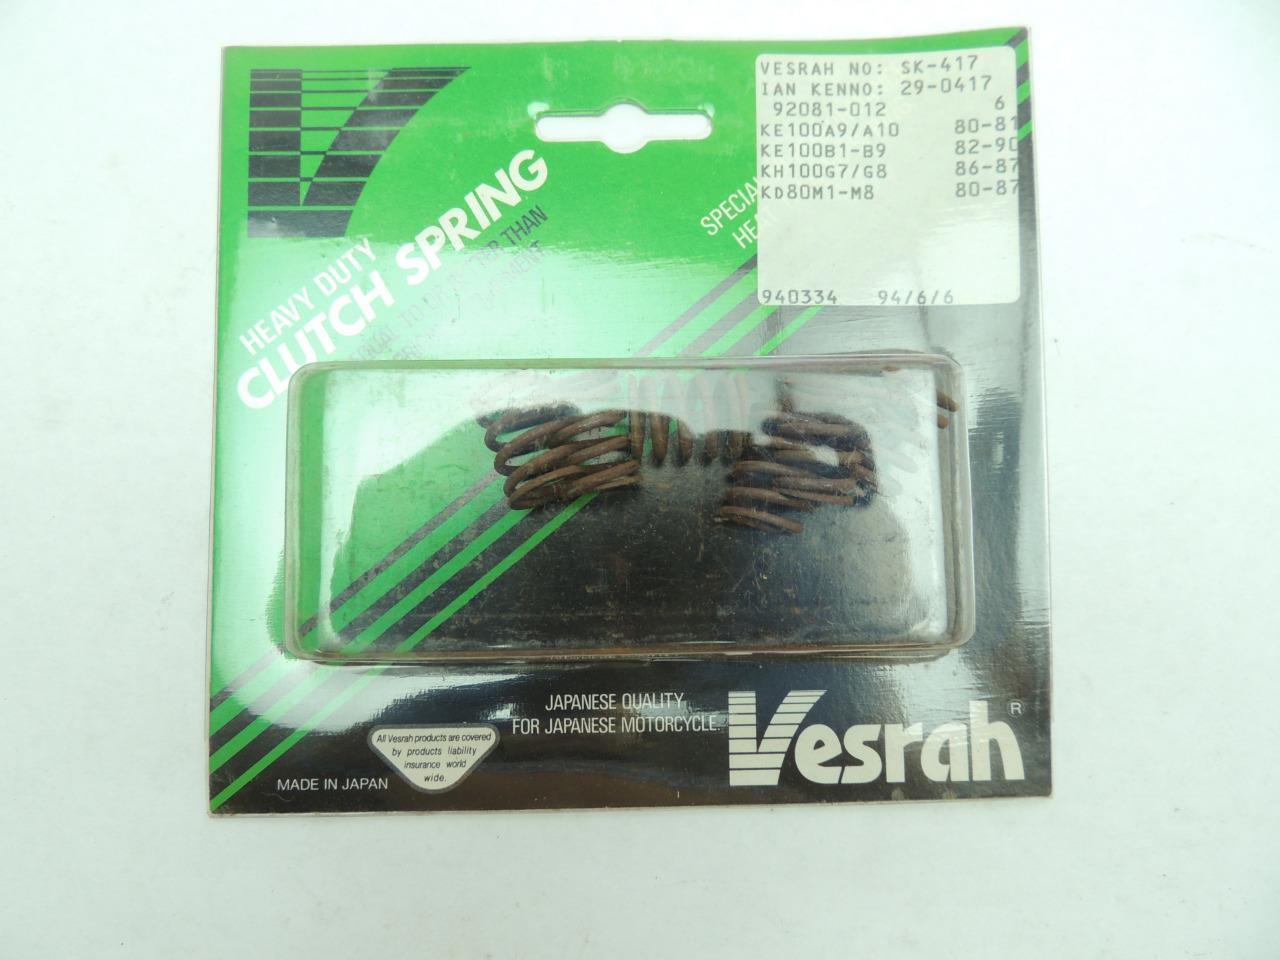 Vesrah Complete Clutch Kit for Kawasaki KM100 1976-1981